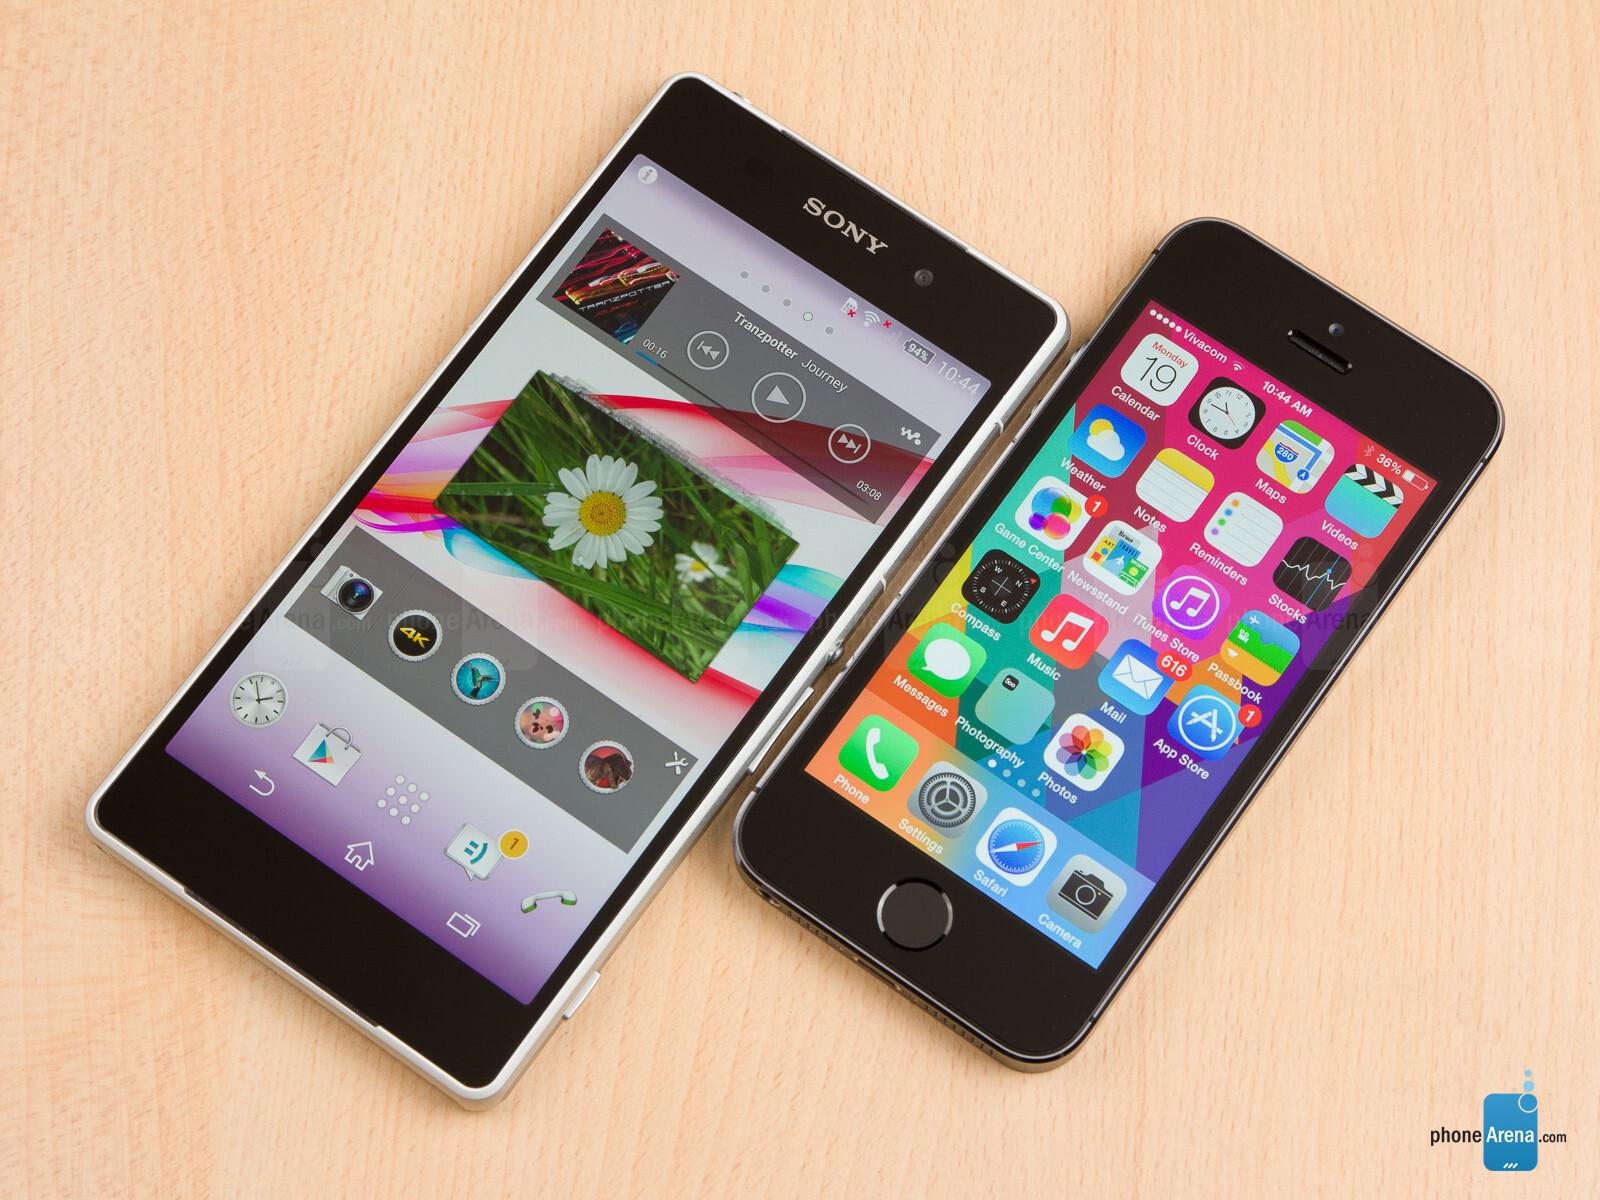 Sony Xperia Z2 vs Apple iPhone 5s 01